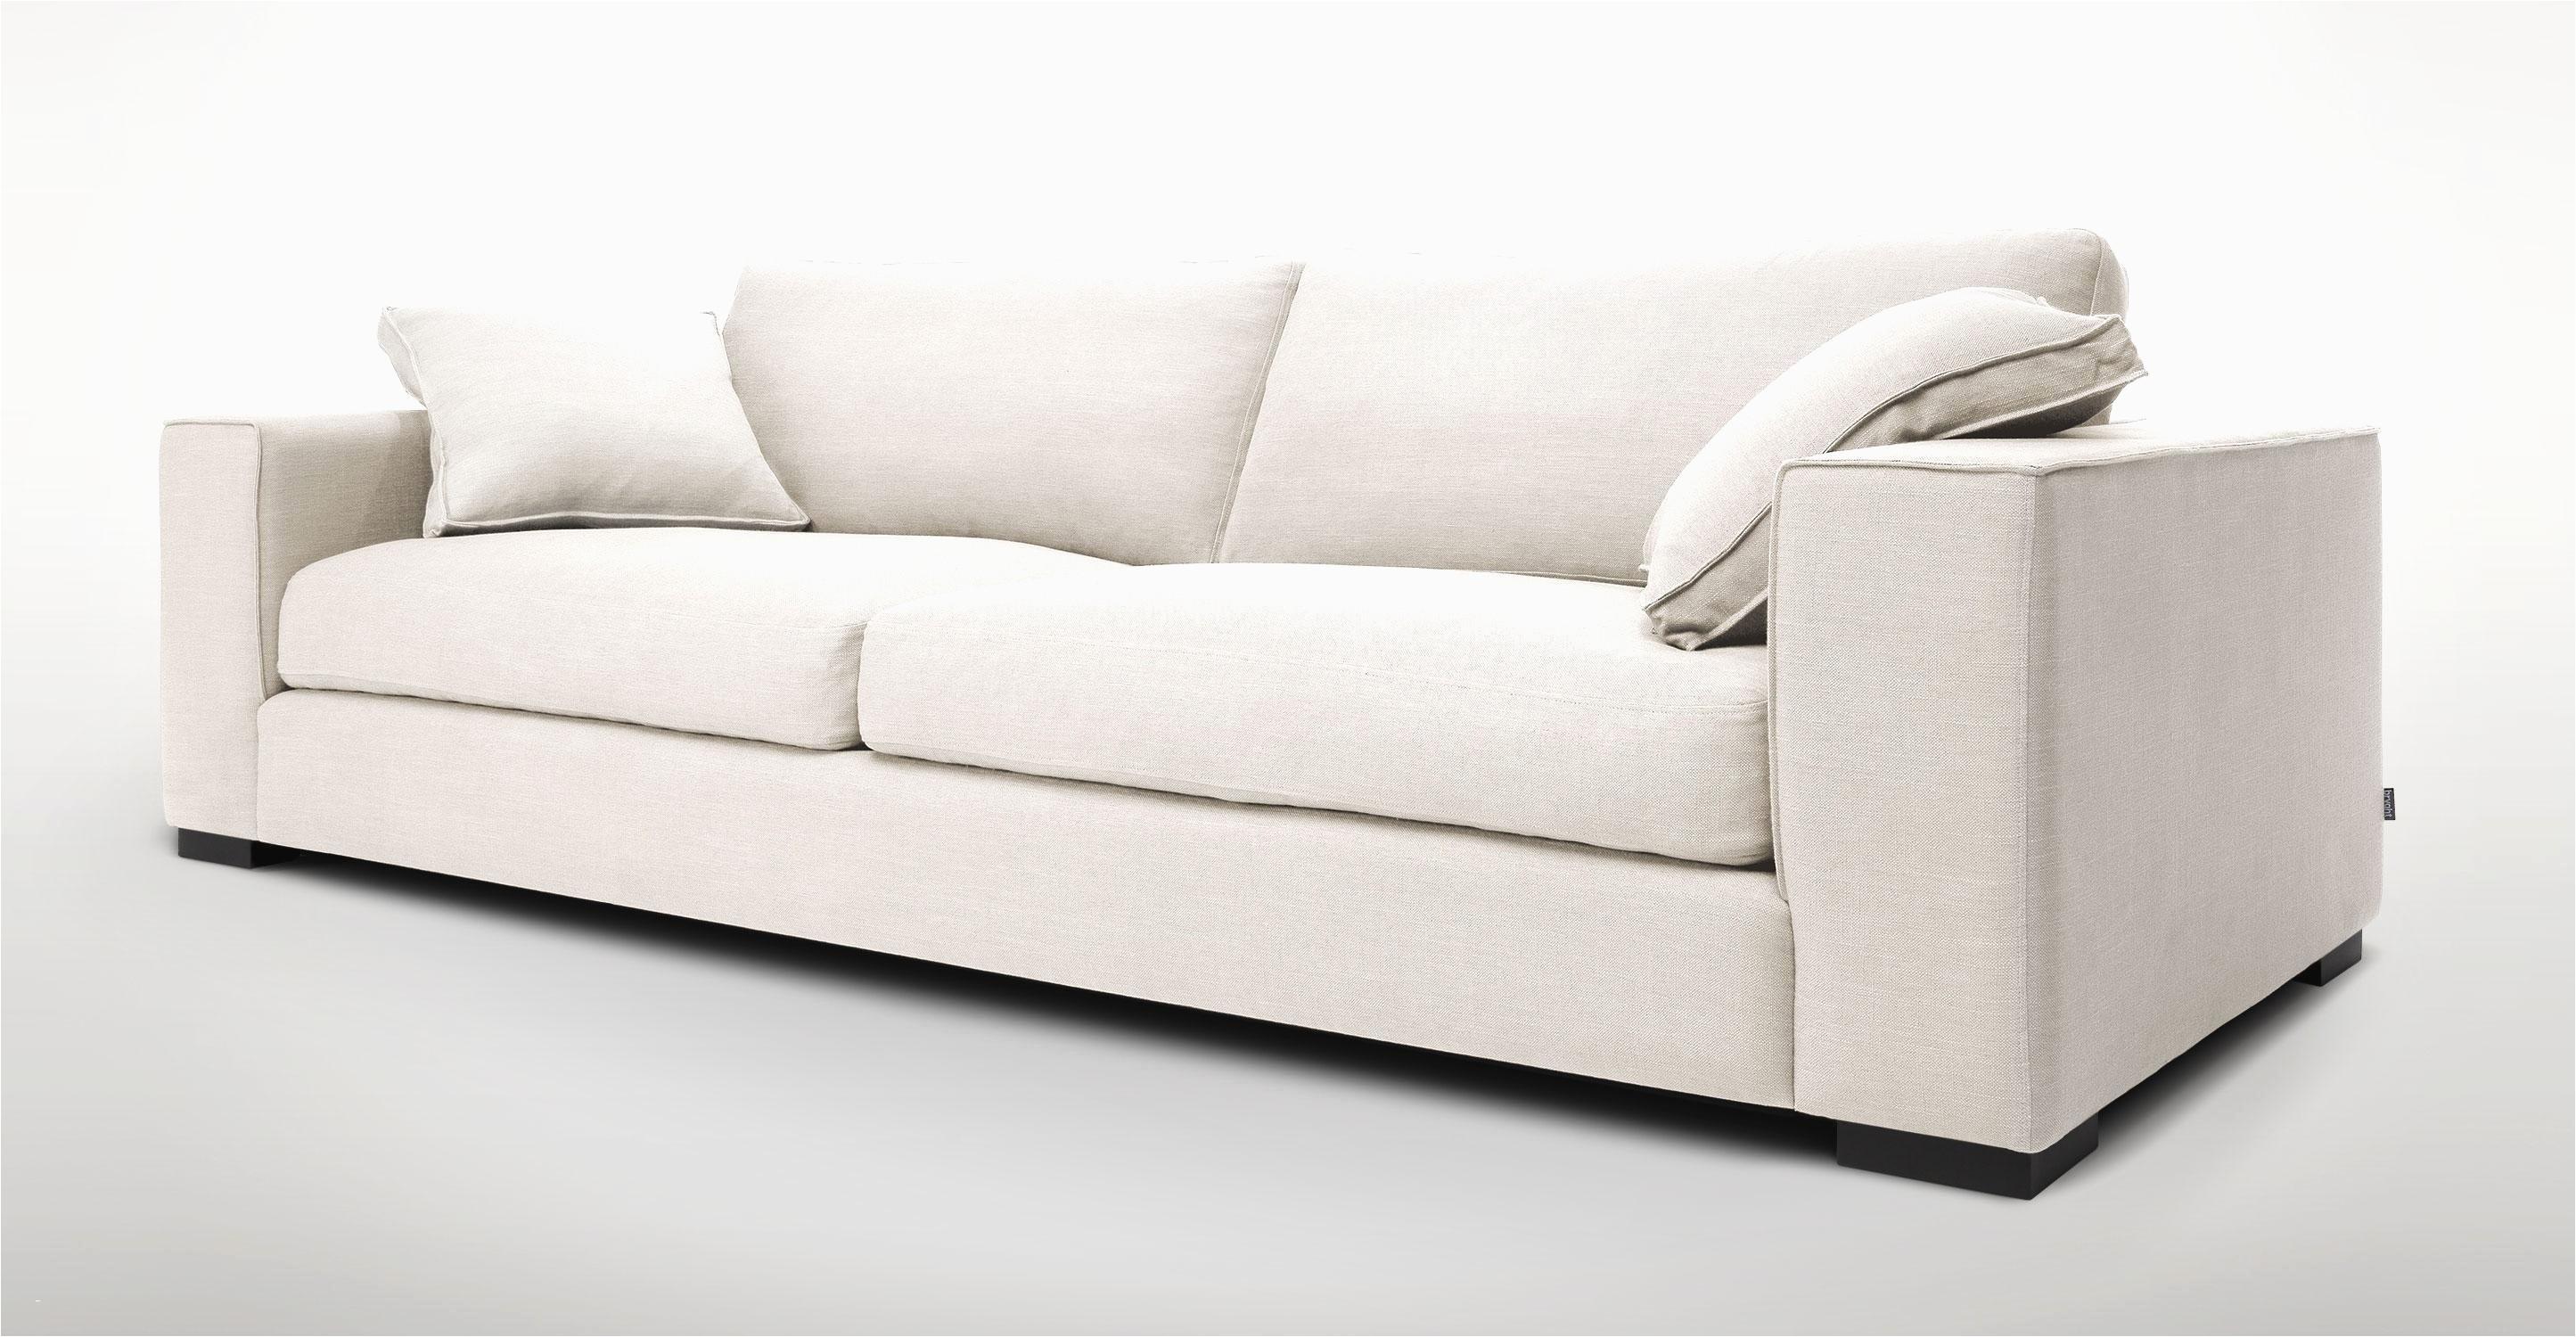 sofa foam replacement lovely furniture sleeper loveseat inspirational wicker outdoor sofa 0d